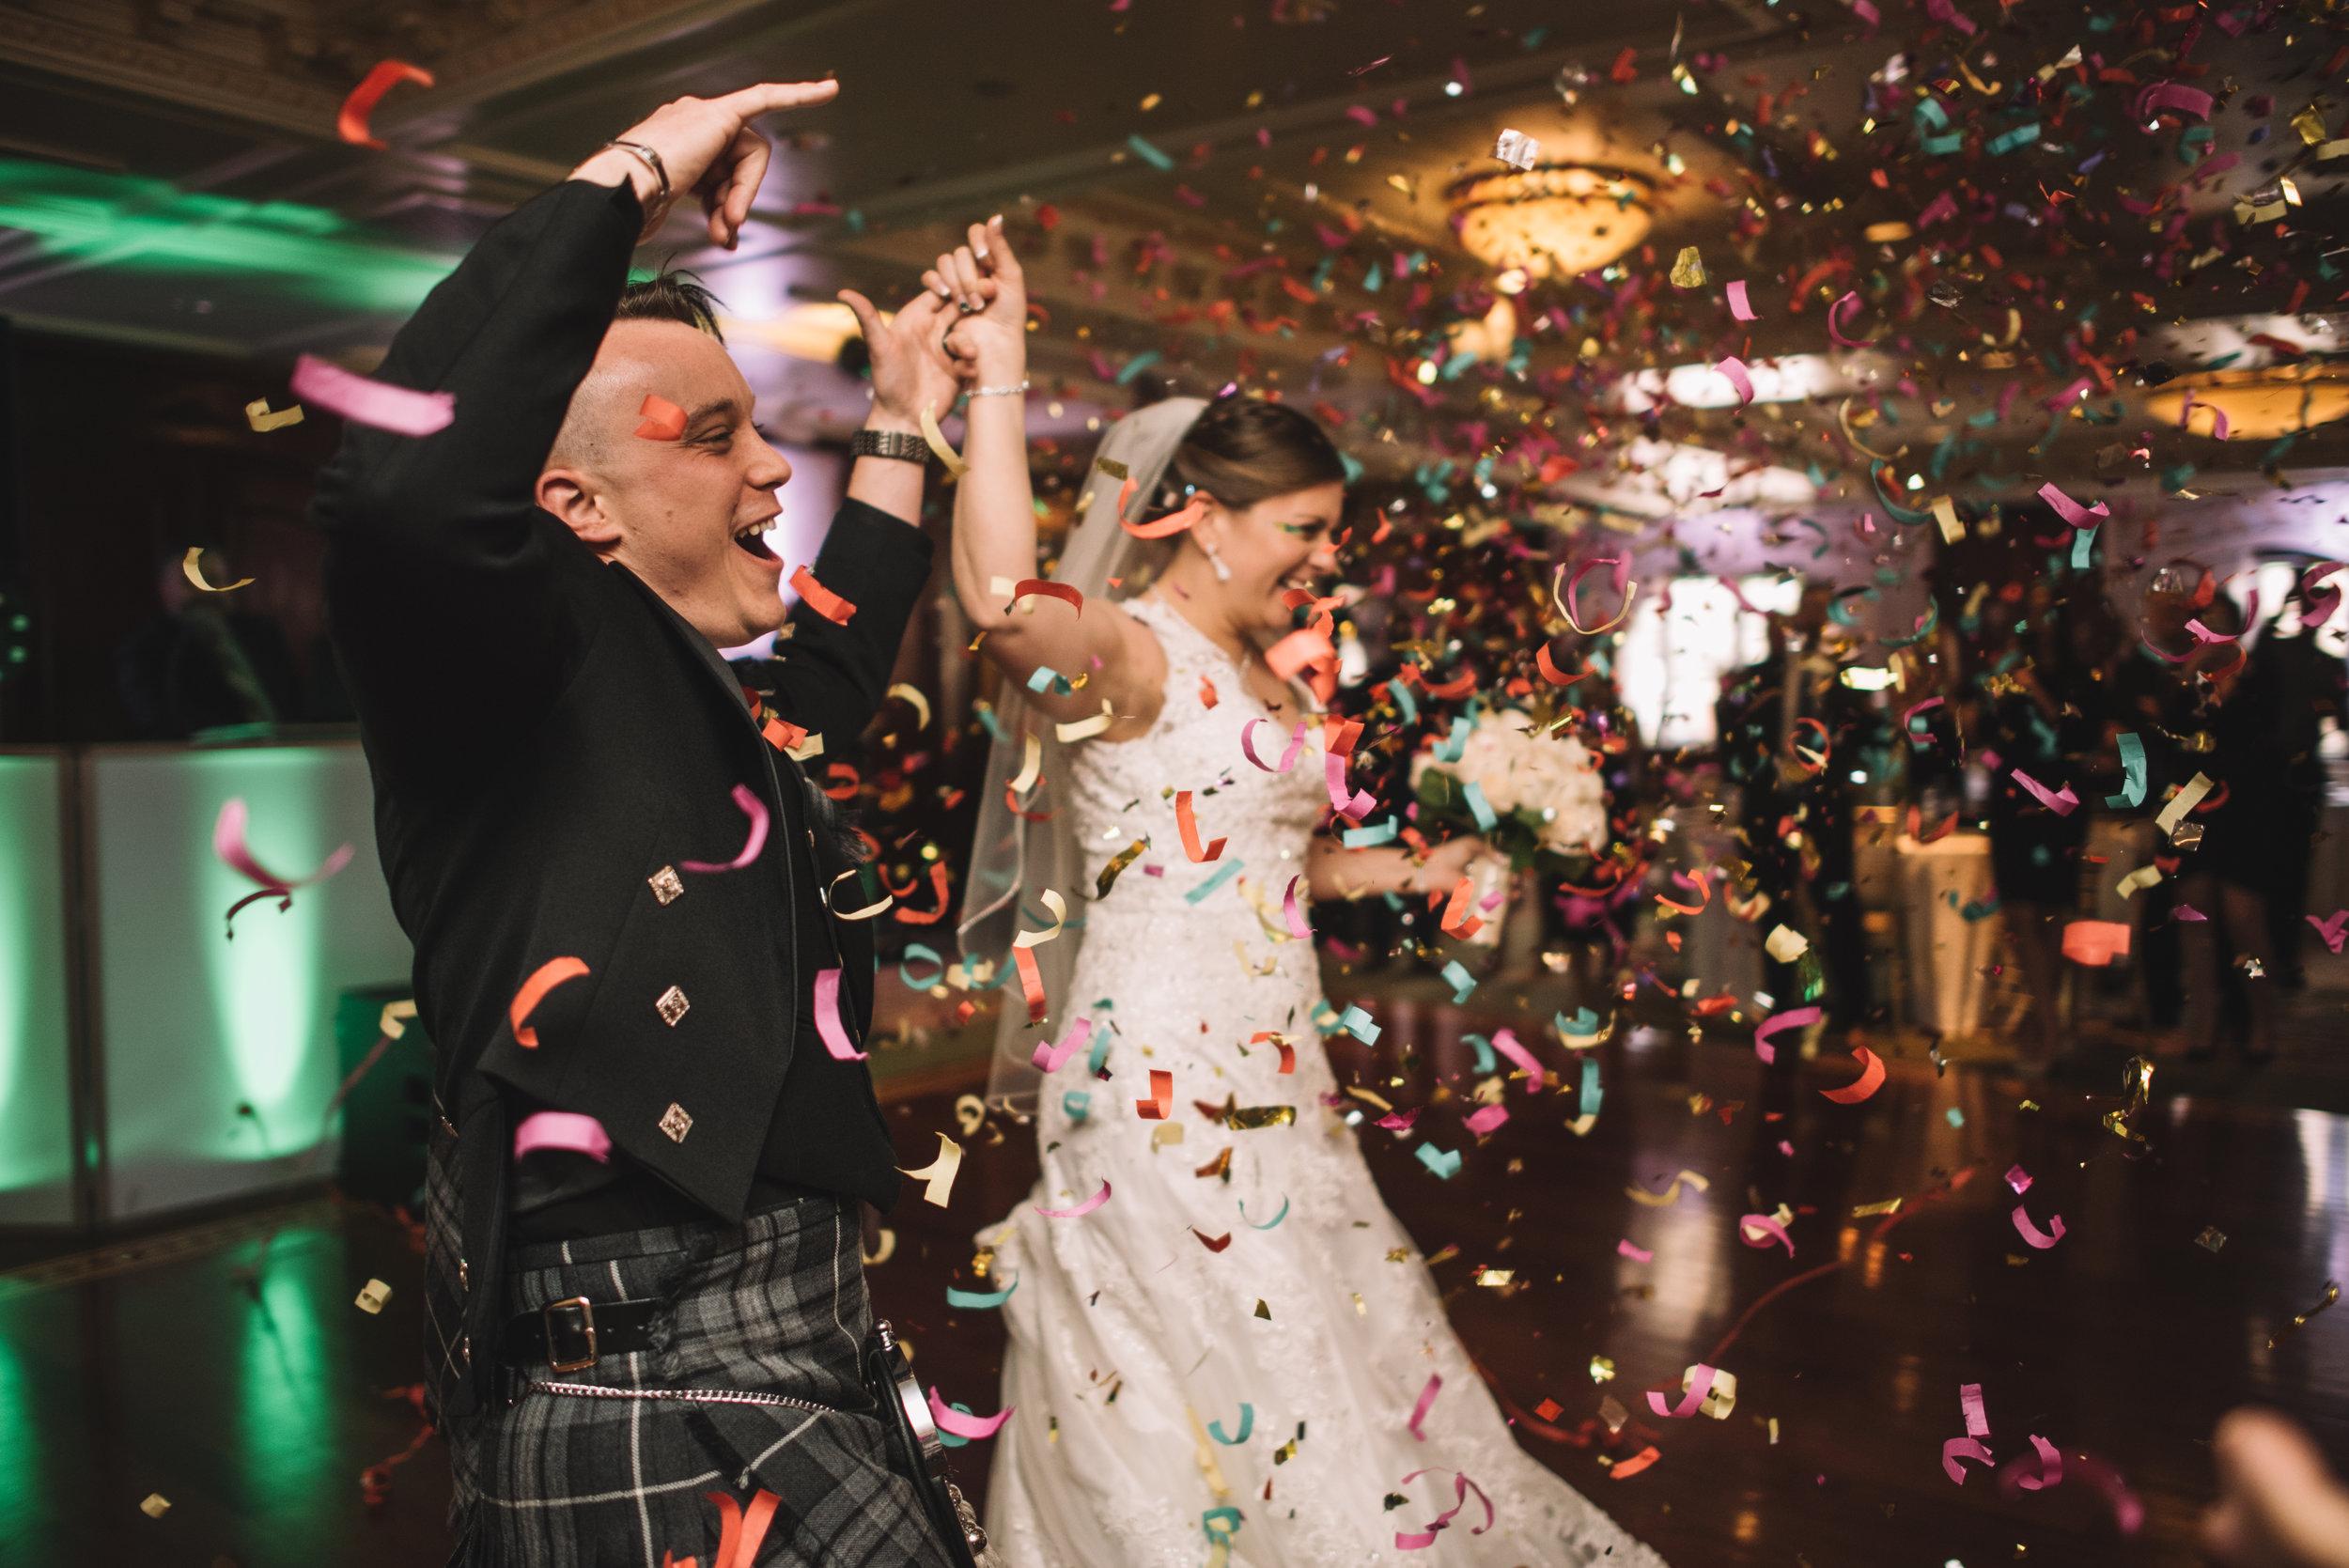 WeddingPhotos | NJPhotographer | Highlights-1-30.jpg